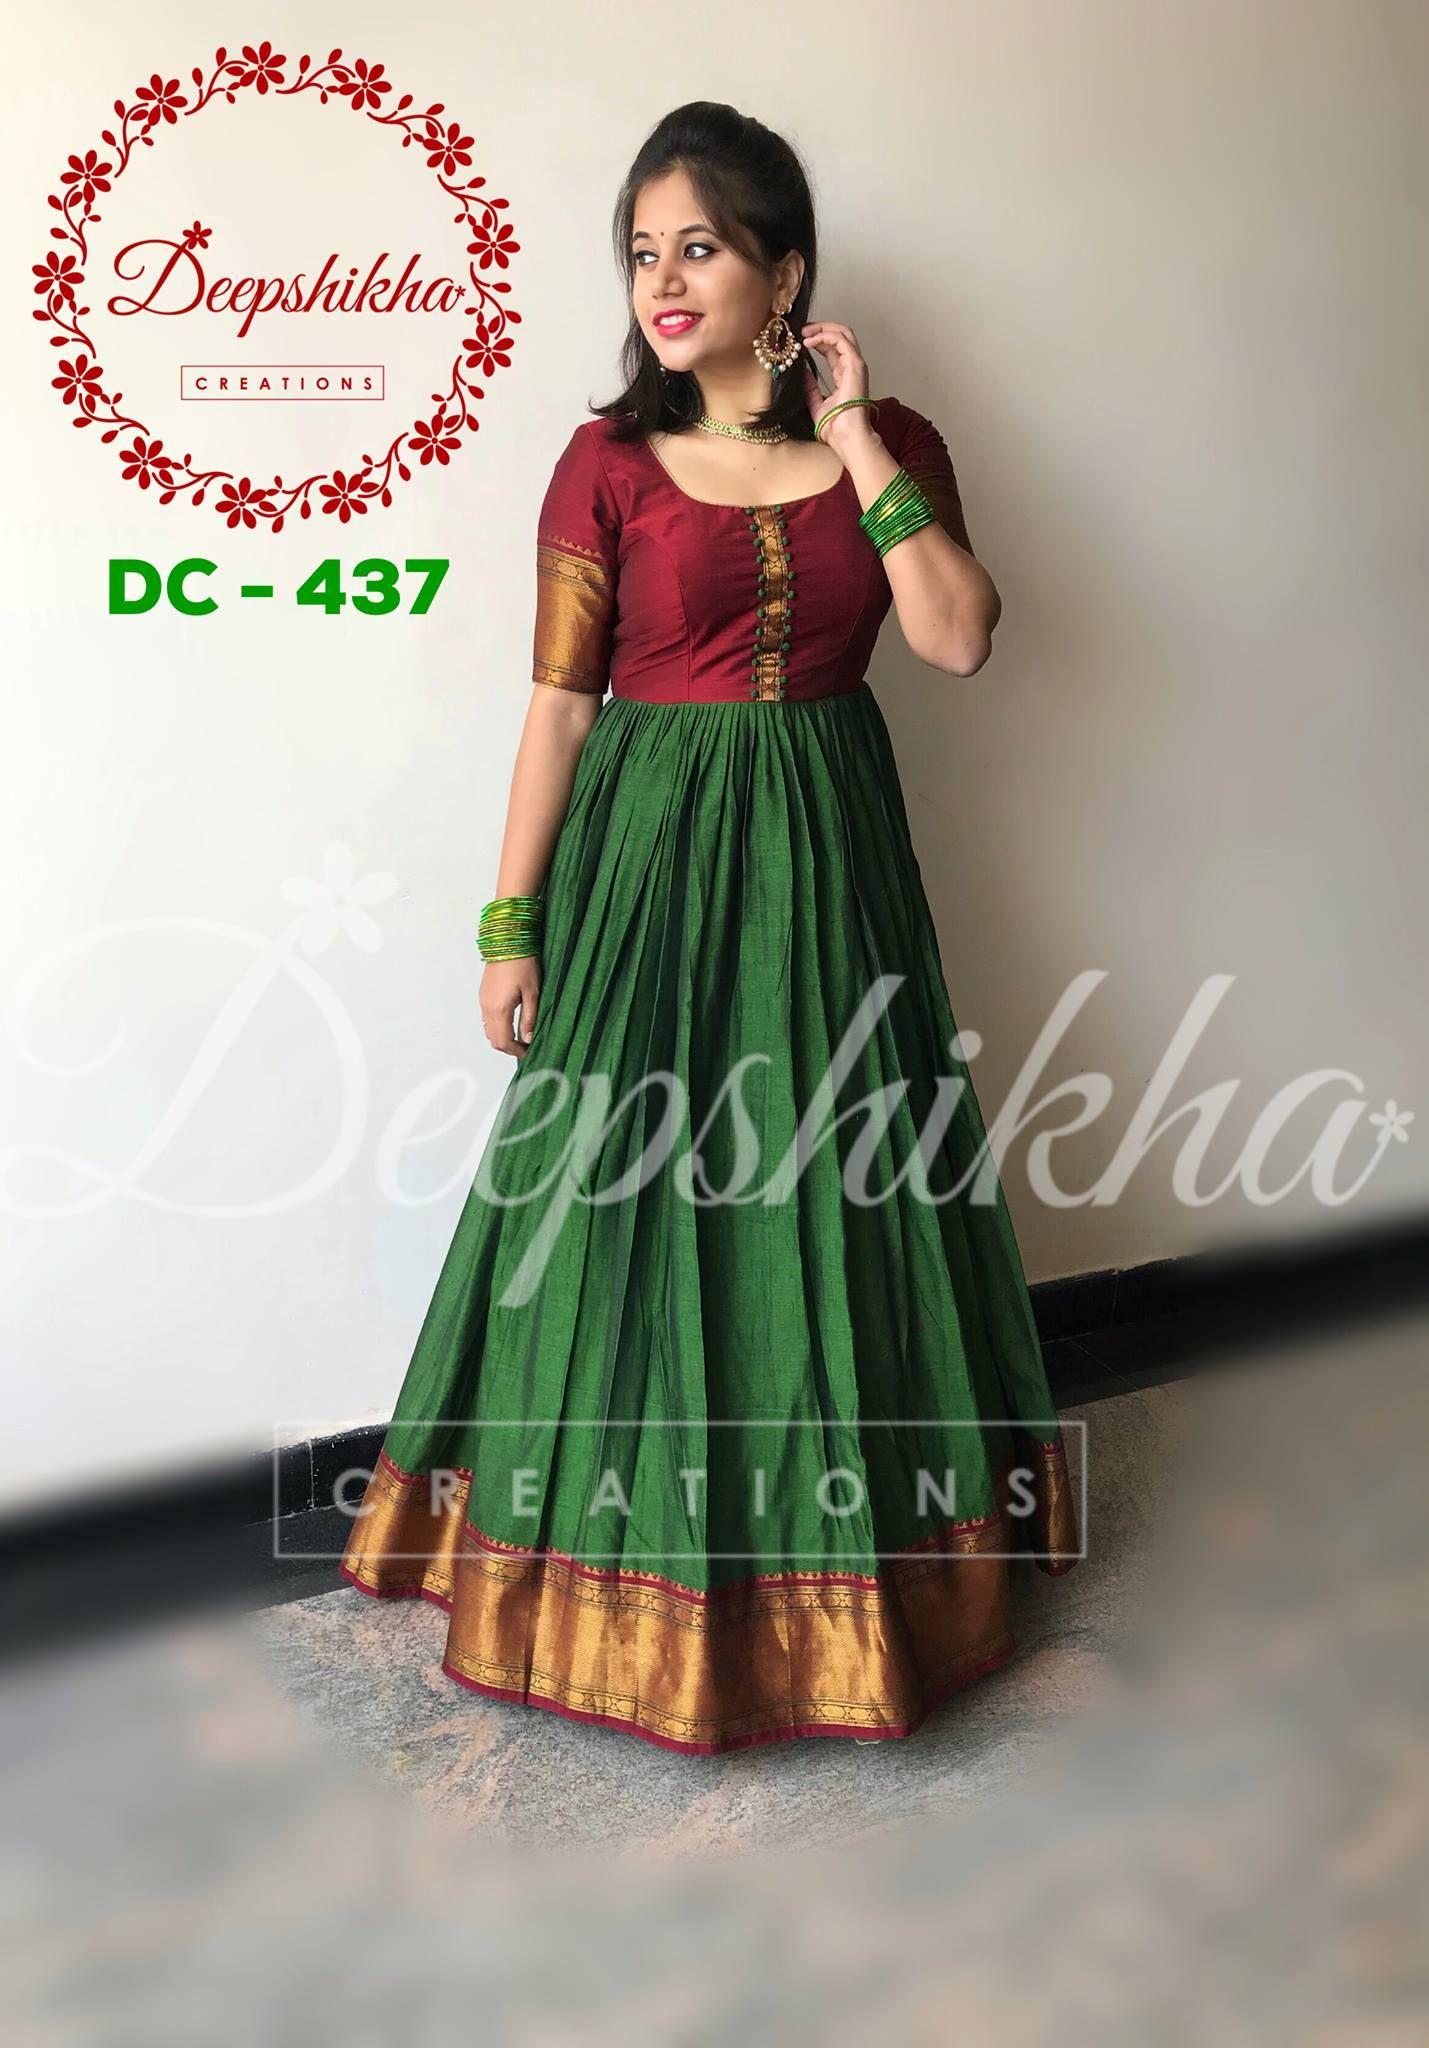 Deepshikha Creations Contact 090596 83293 Email